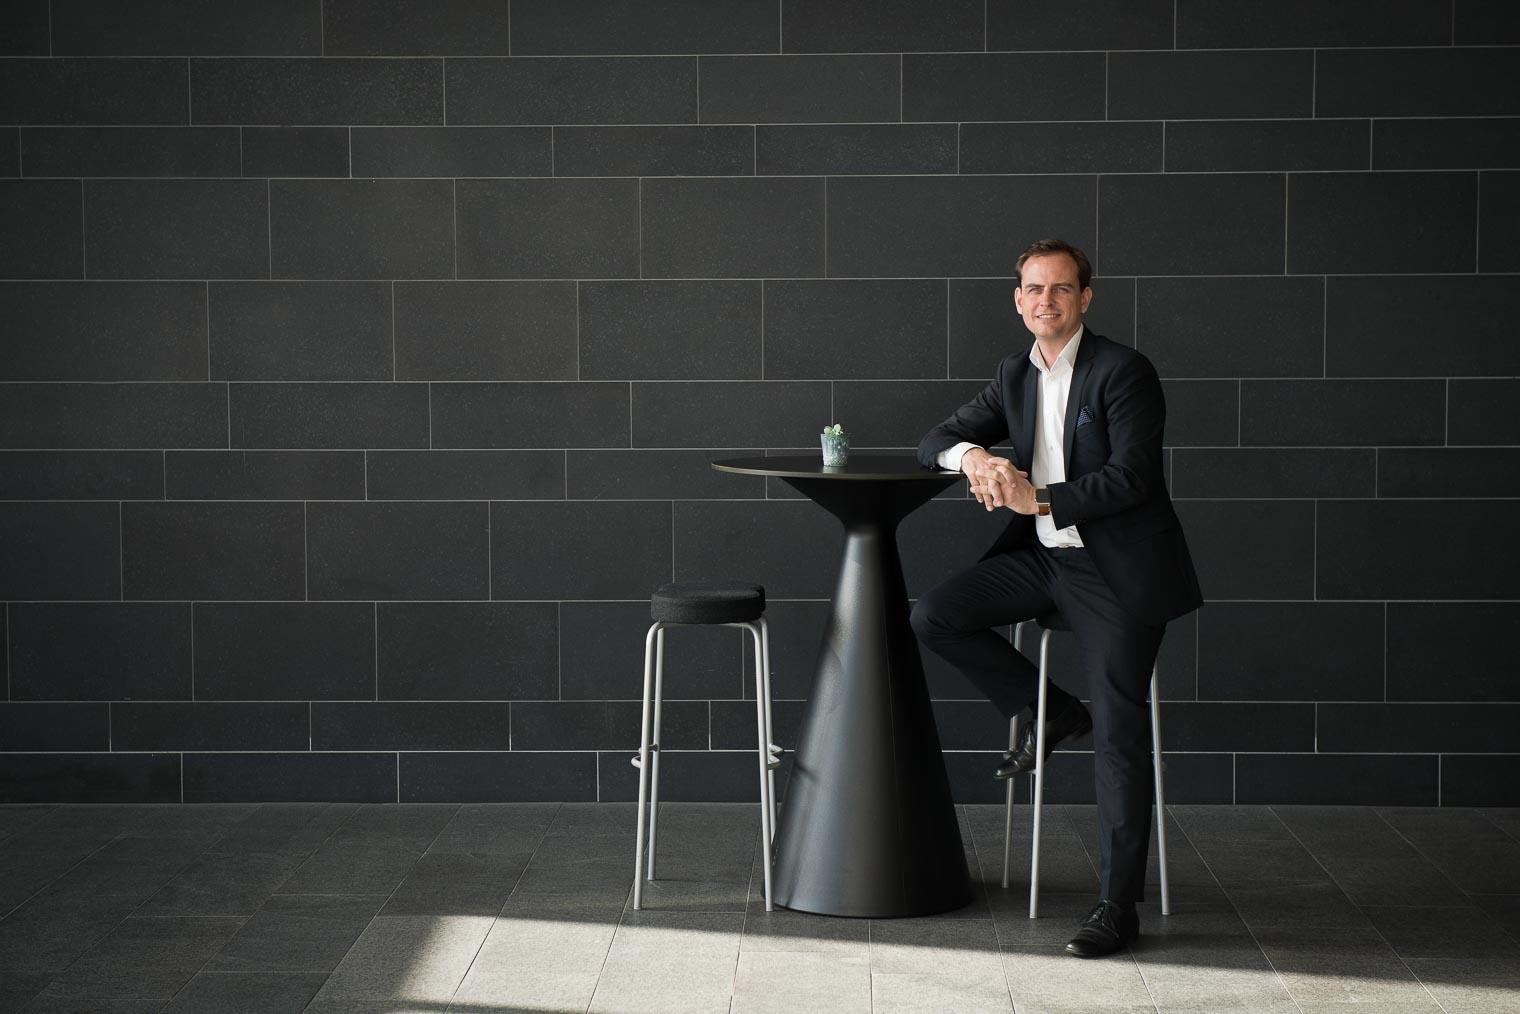 Markus Granlund - CEO of Semcon